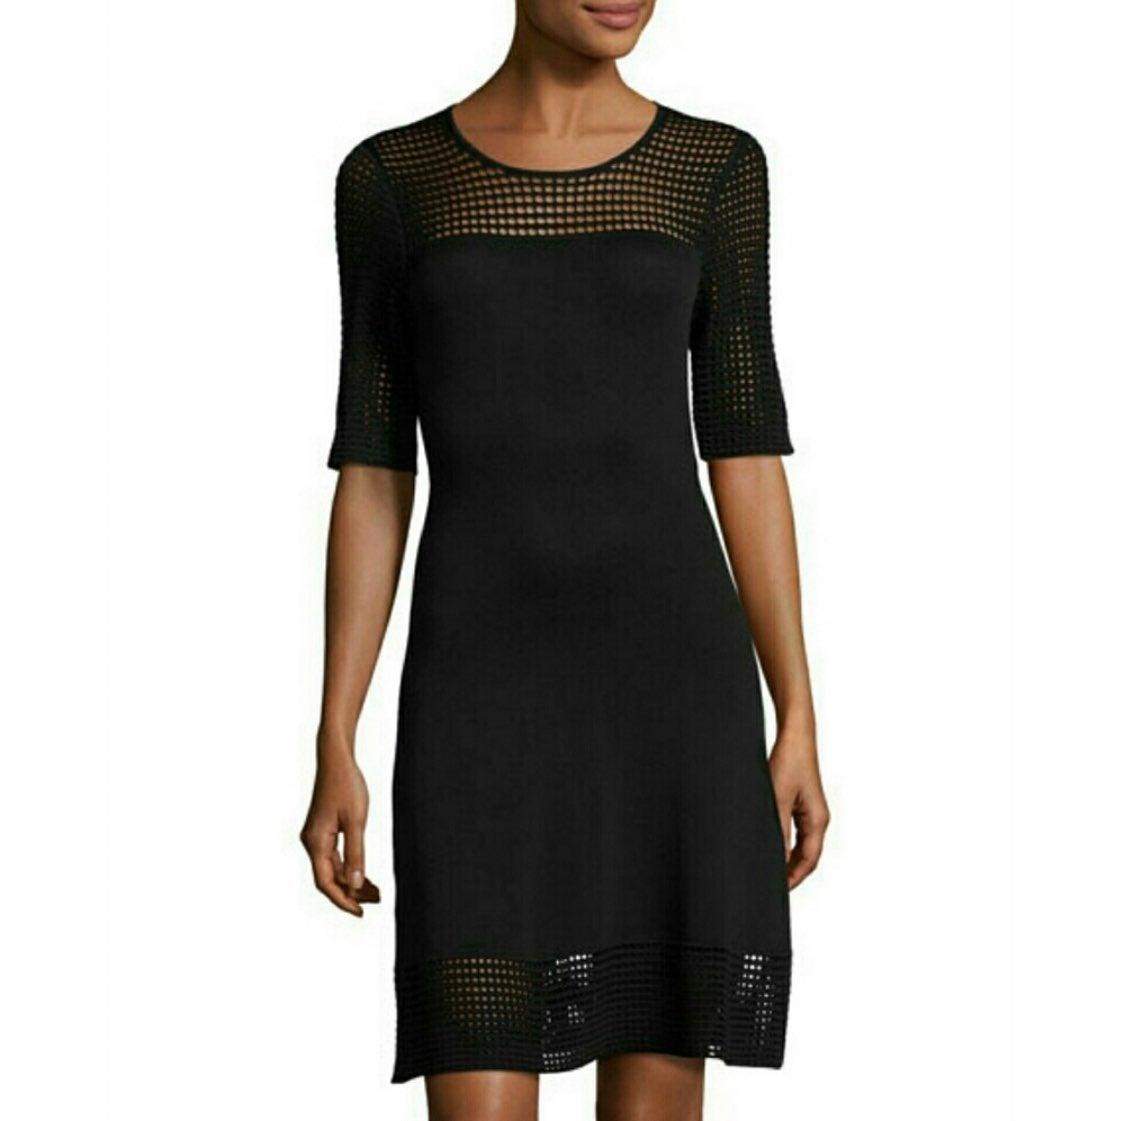 Nanette Lenore Knit Mesh Black Dress M